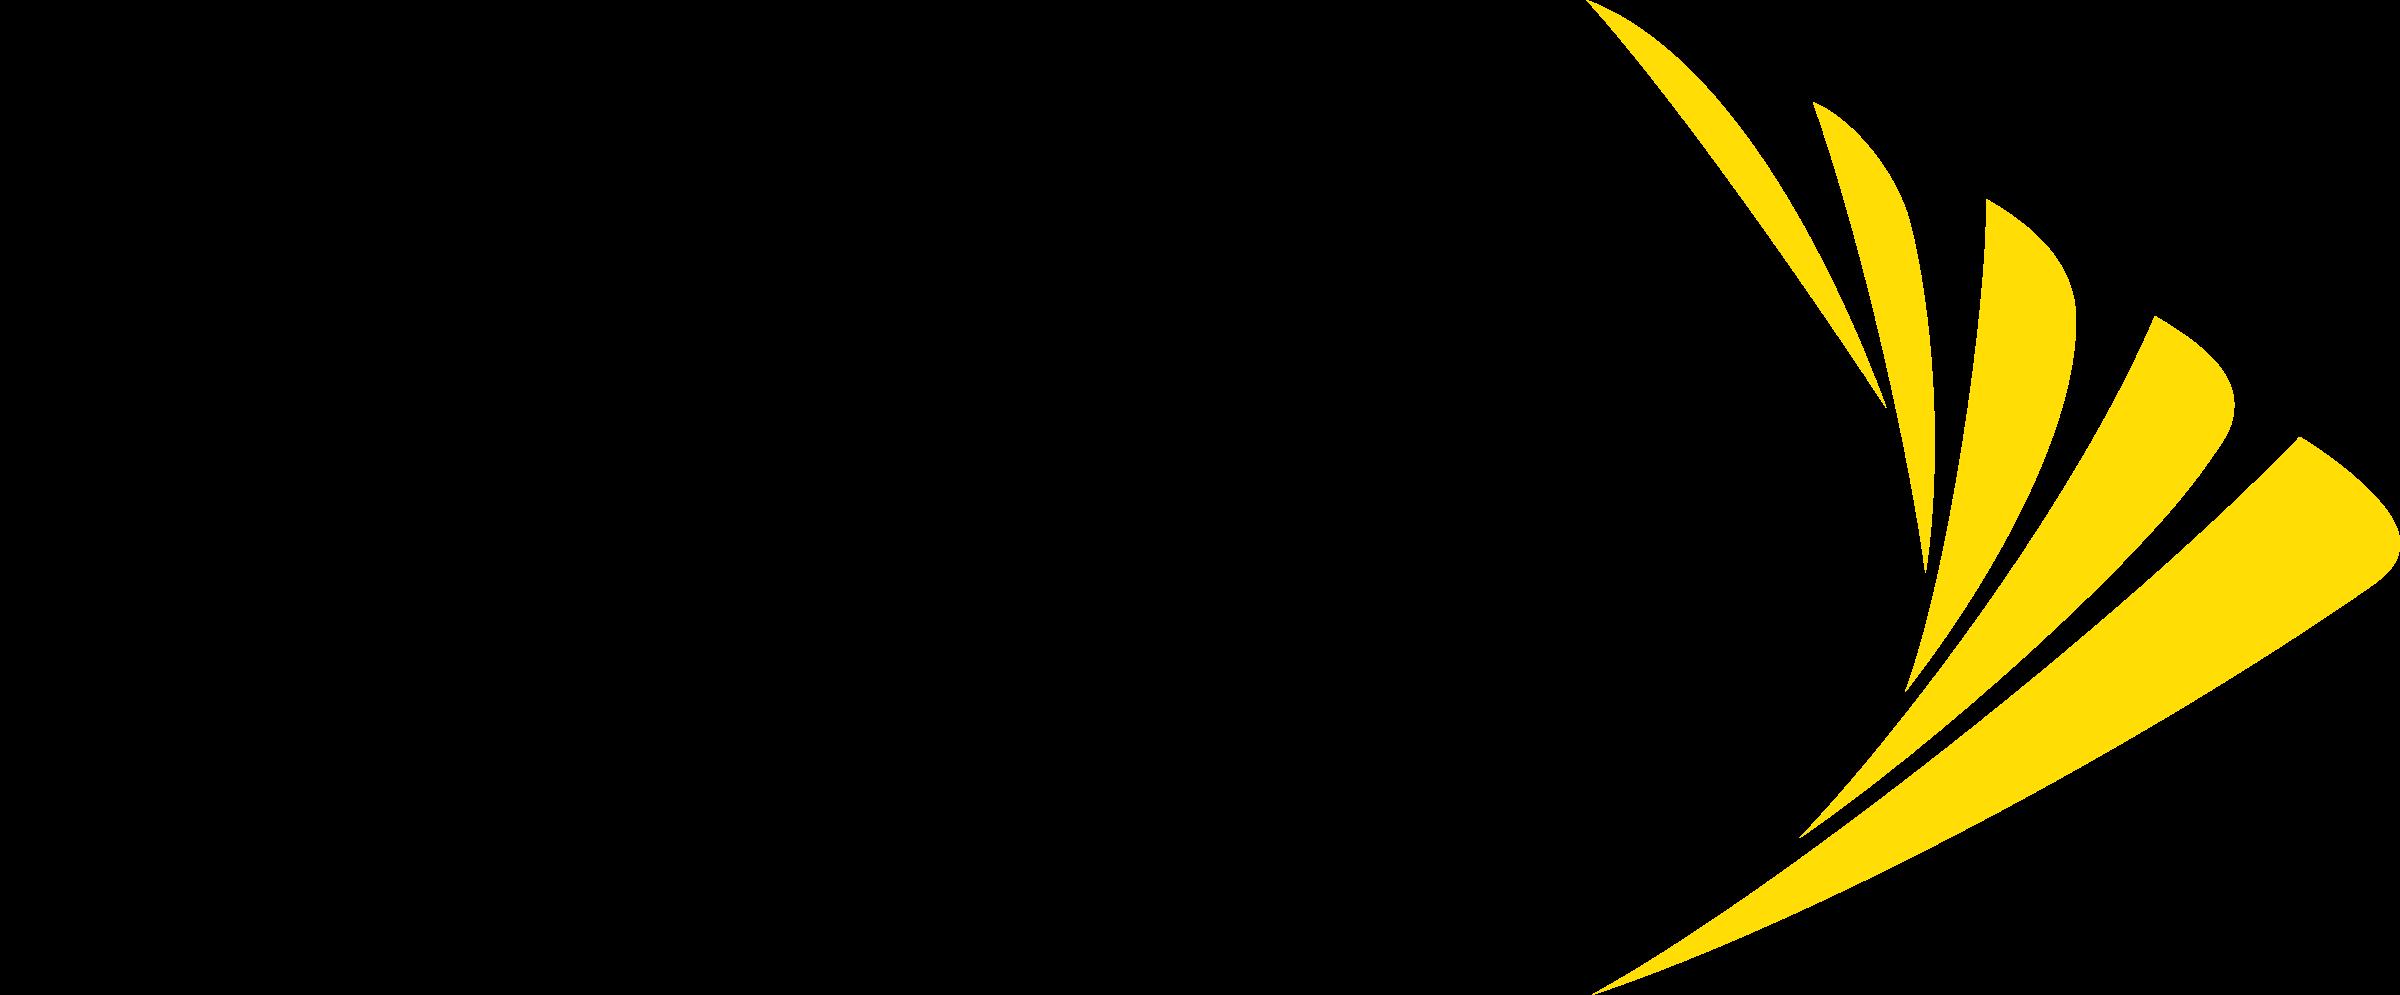 sprint-nextel-logo-png-transparent.png